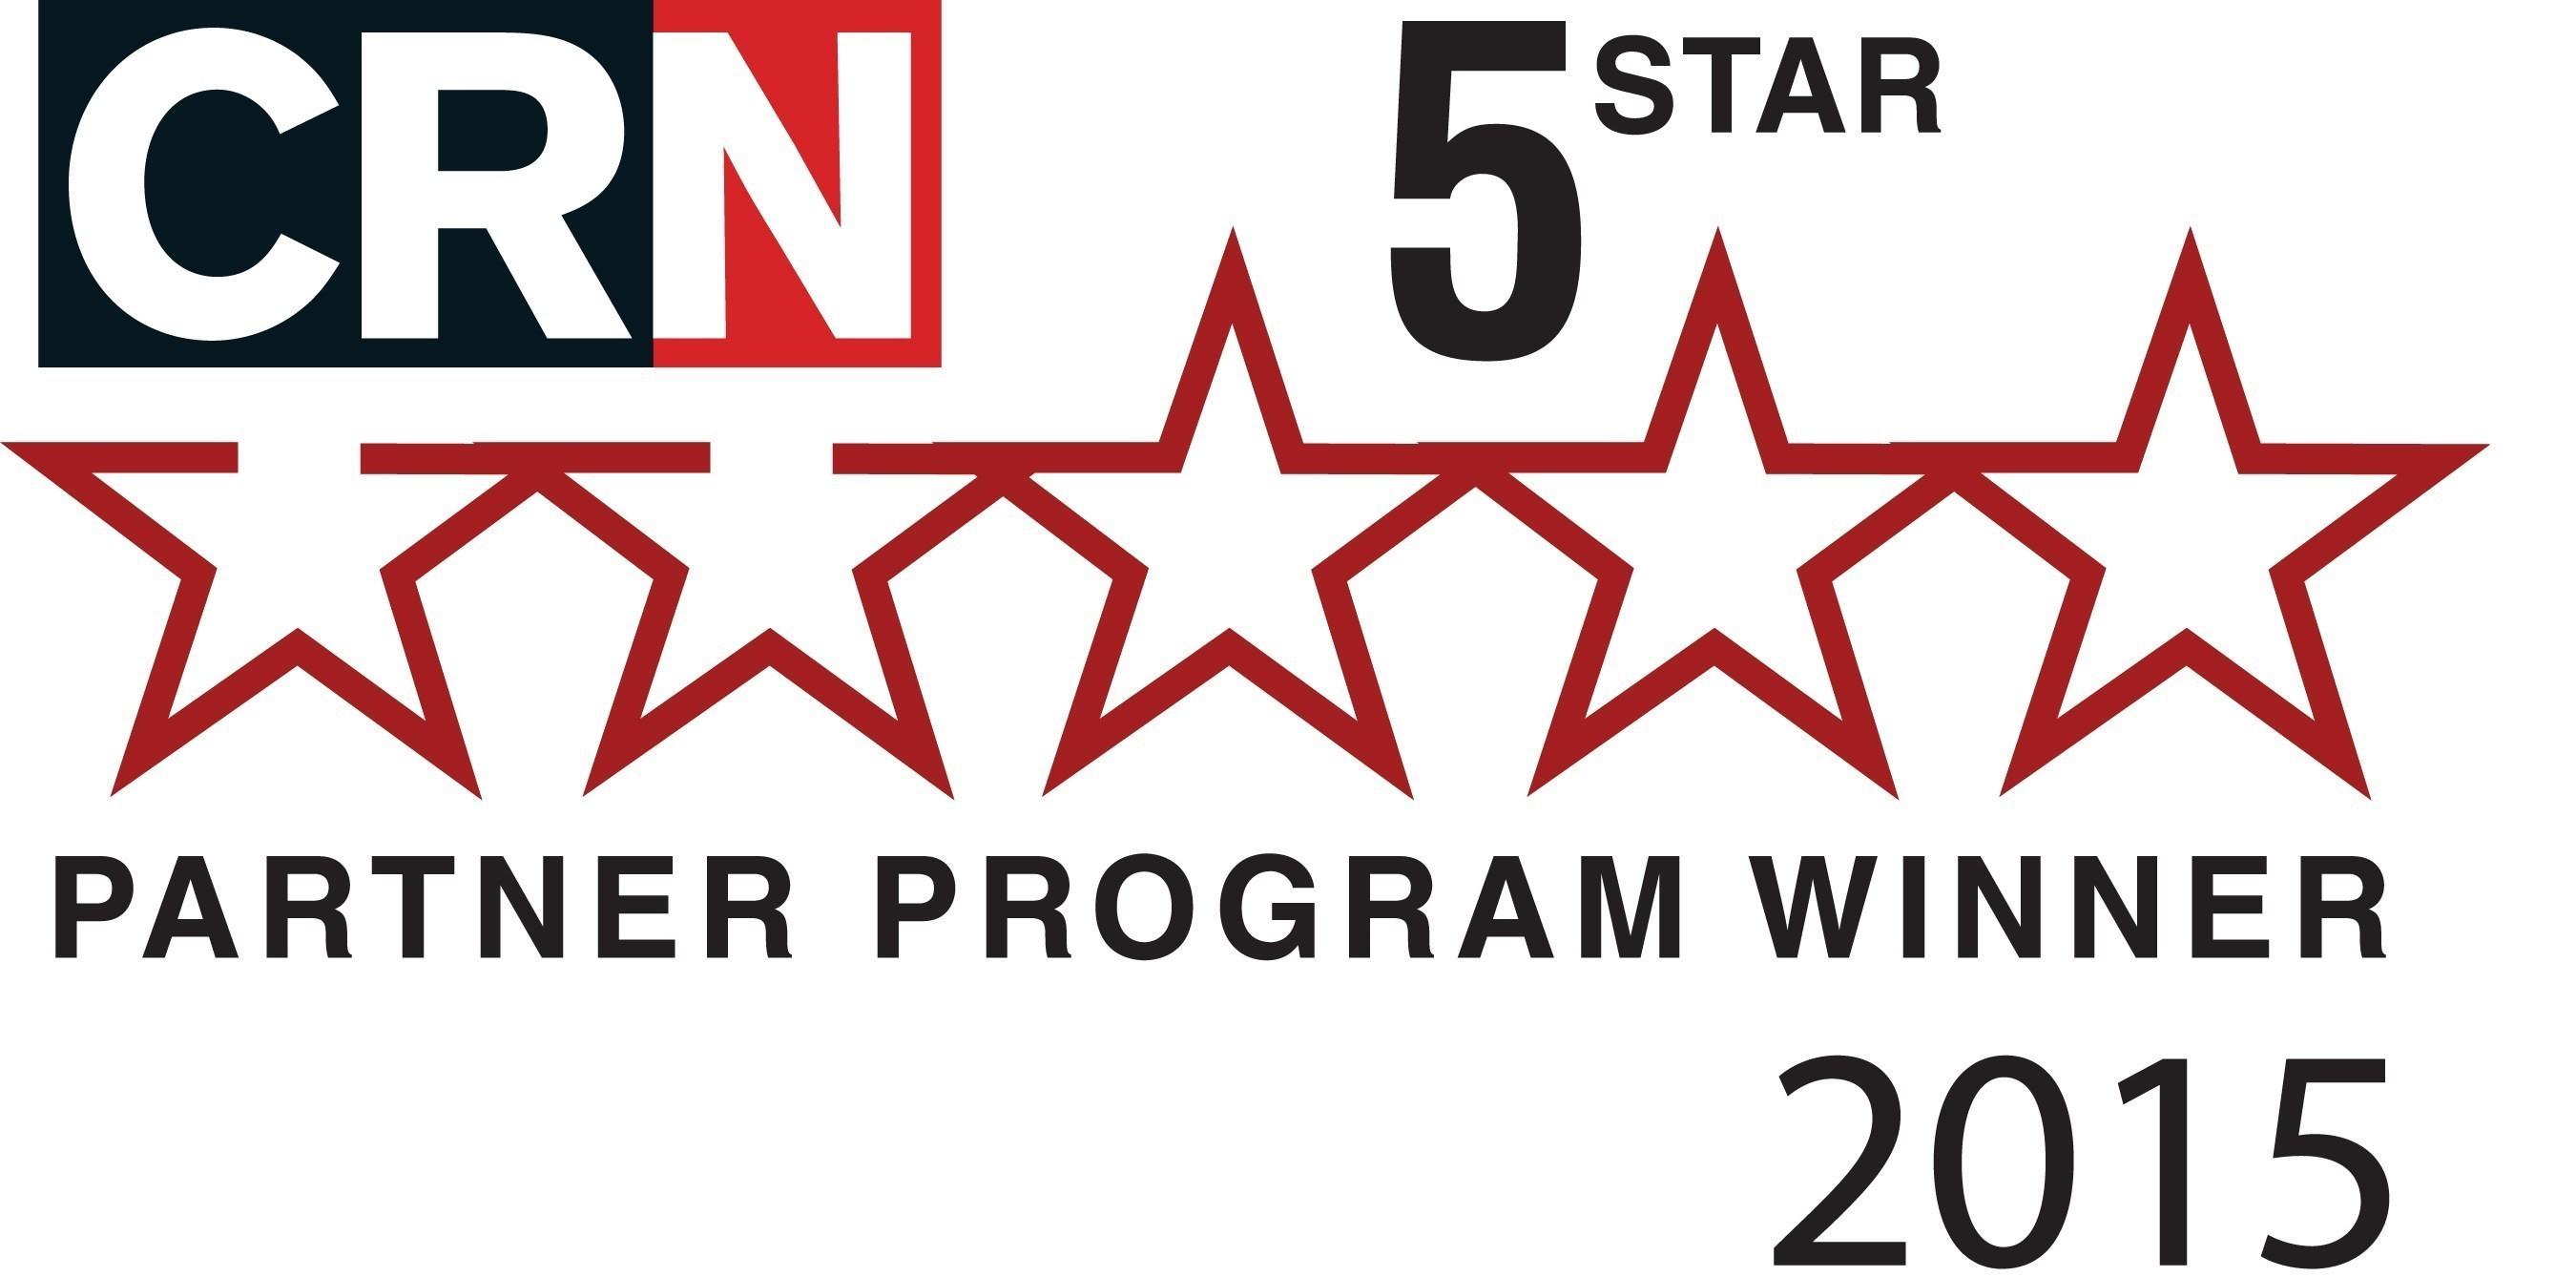 Ruckus Wireless BiG DOGs Partner Program - a 2015 CRN 5-Star Partner Program Winner